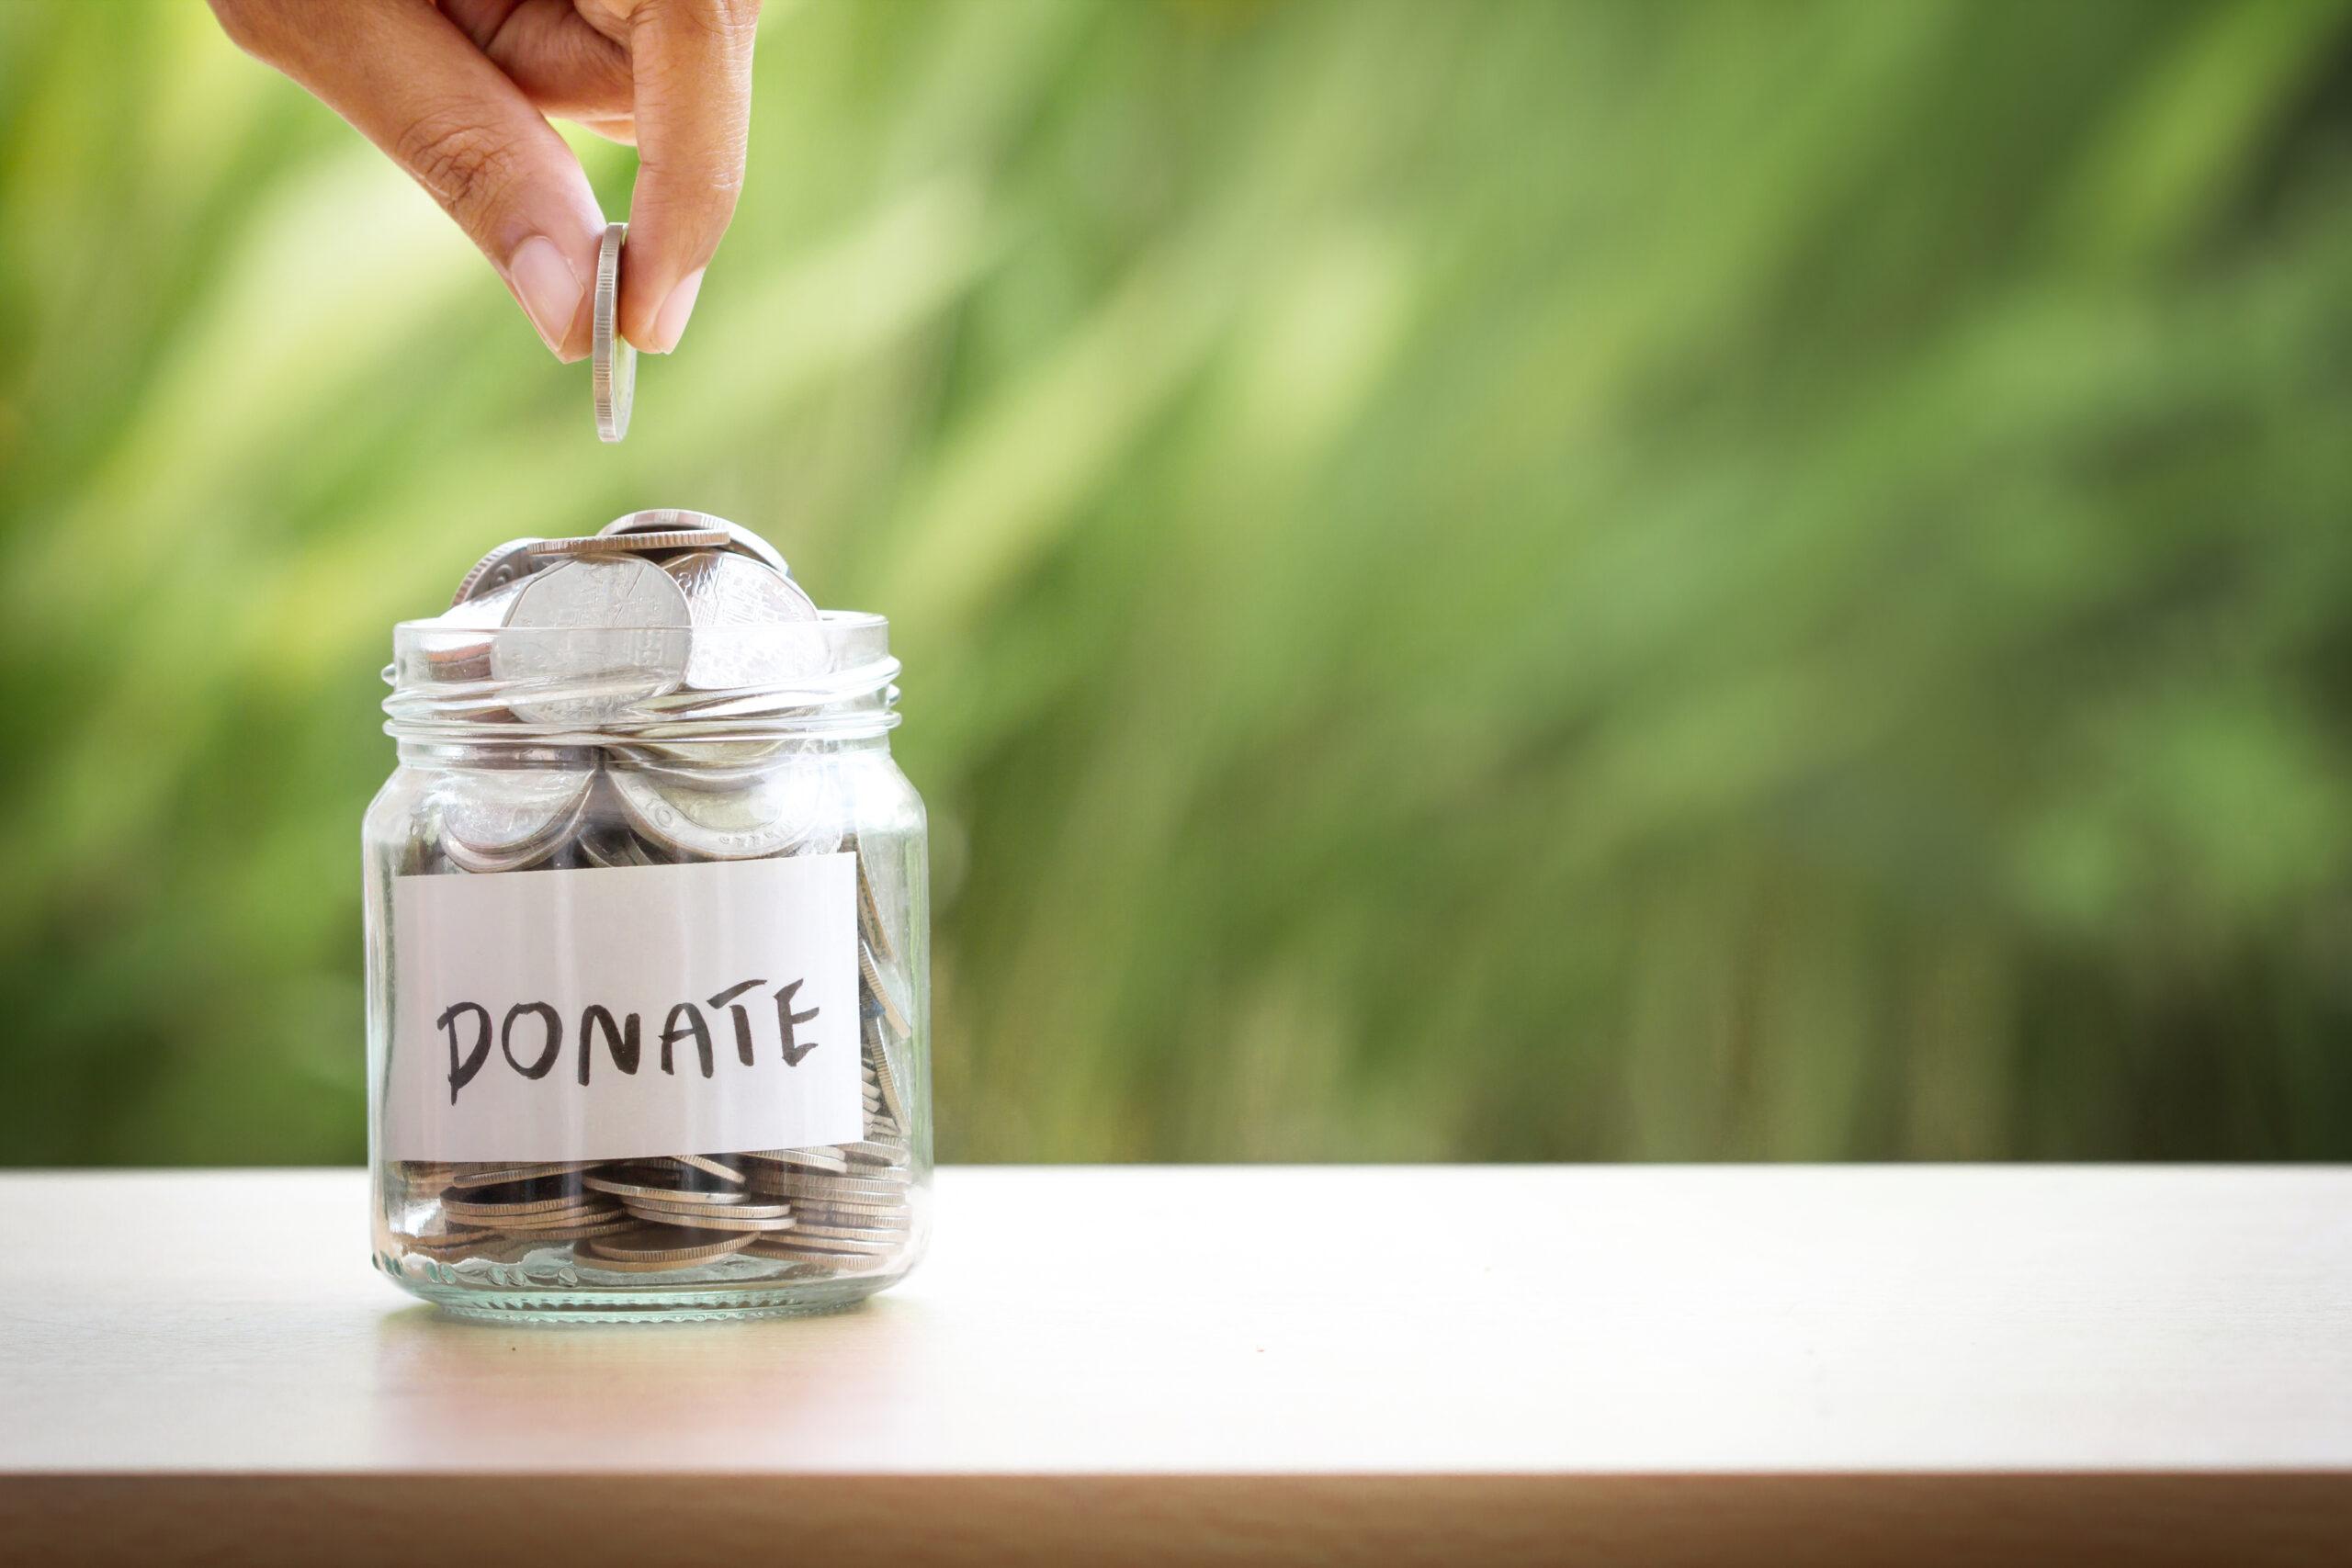 money in donation jar